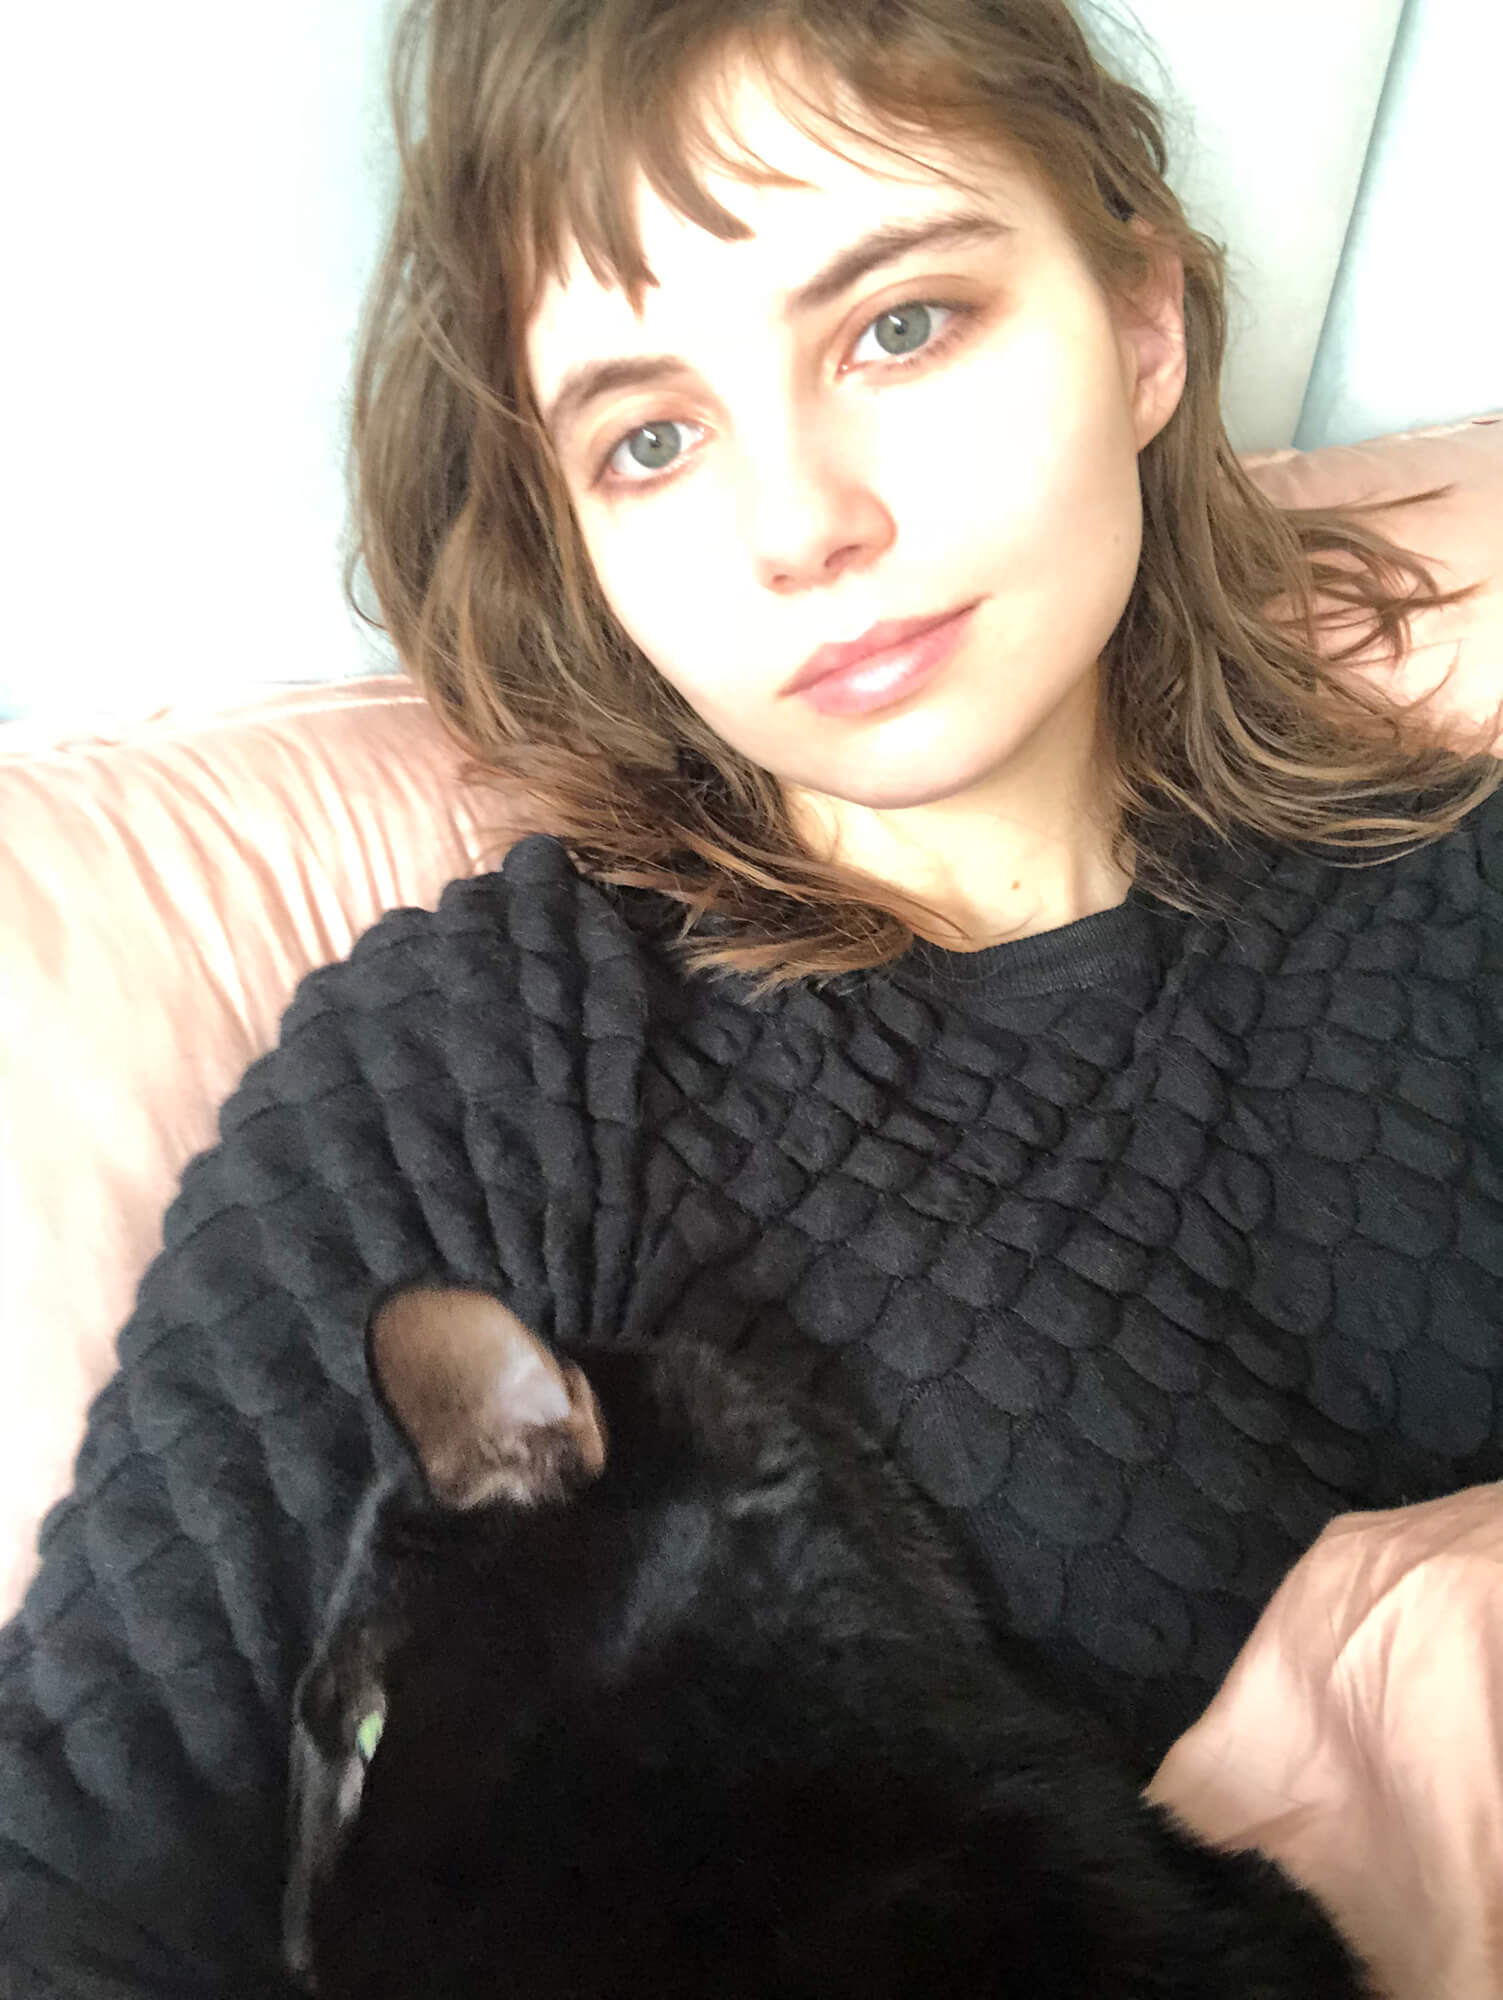 https://liararoux.xxx/wp-content/uploads/2018/10/Liara-Roux-Selfies-and-Snapshots-September-2018-016.jpg